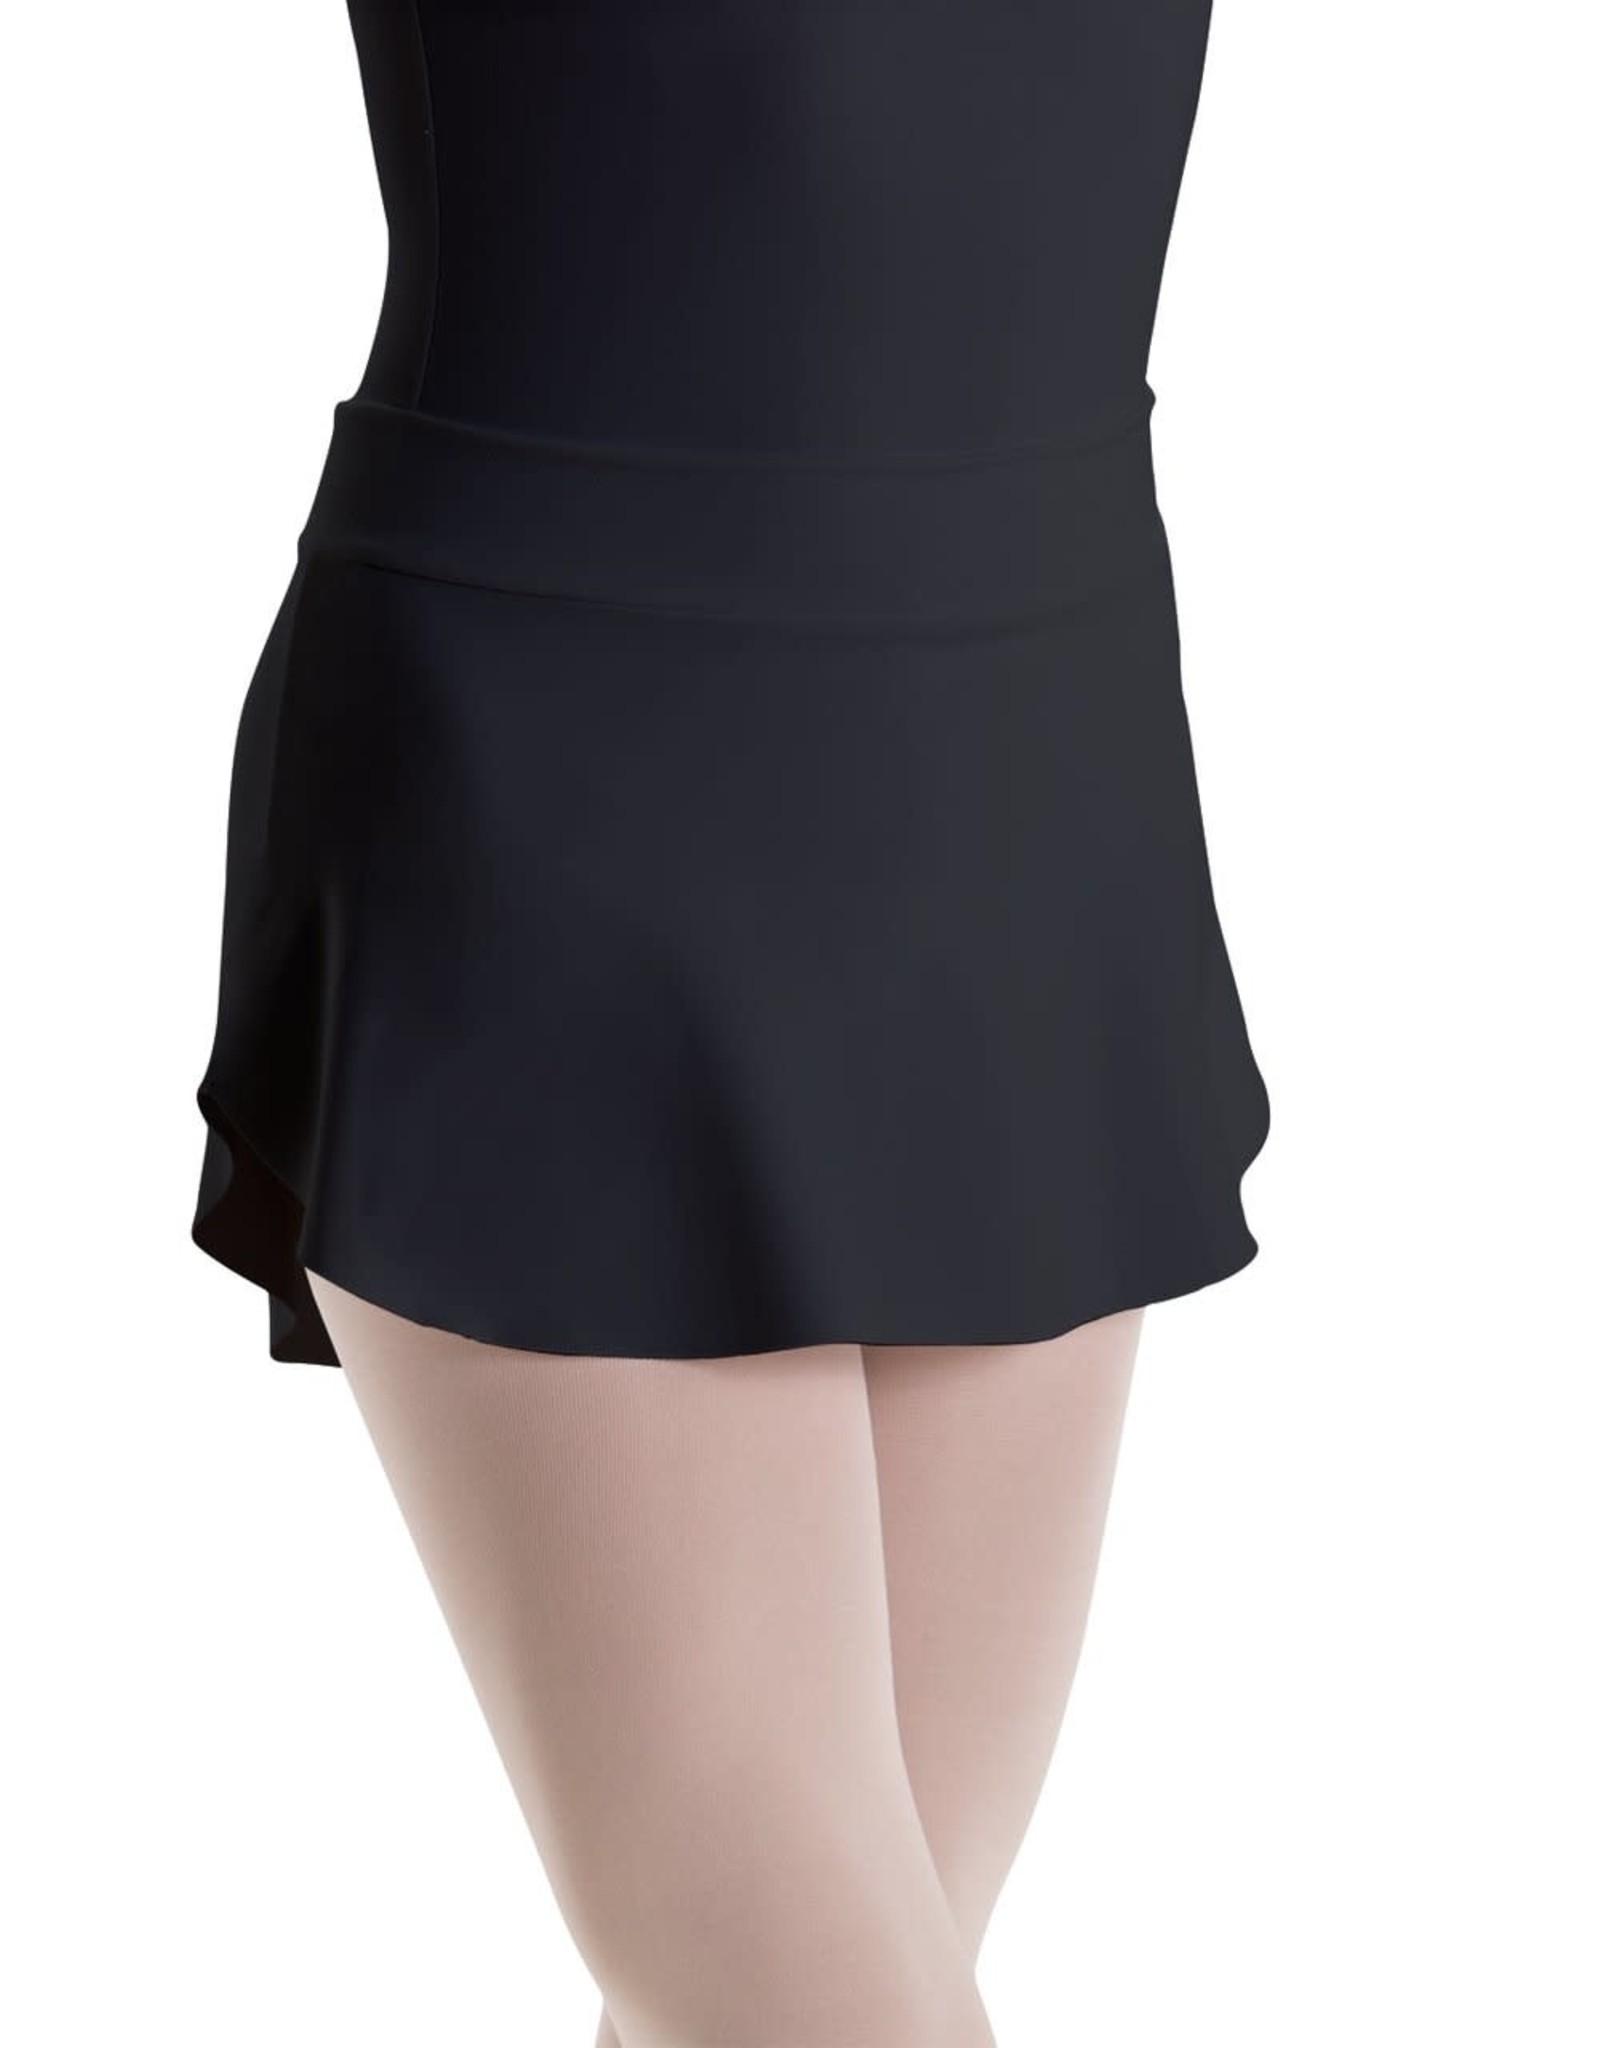 Motionwear Motionwear Solid Pull On Skirt 1236